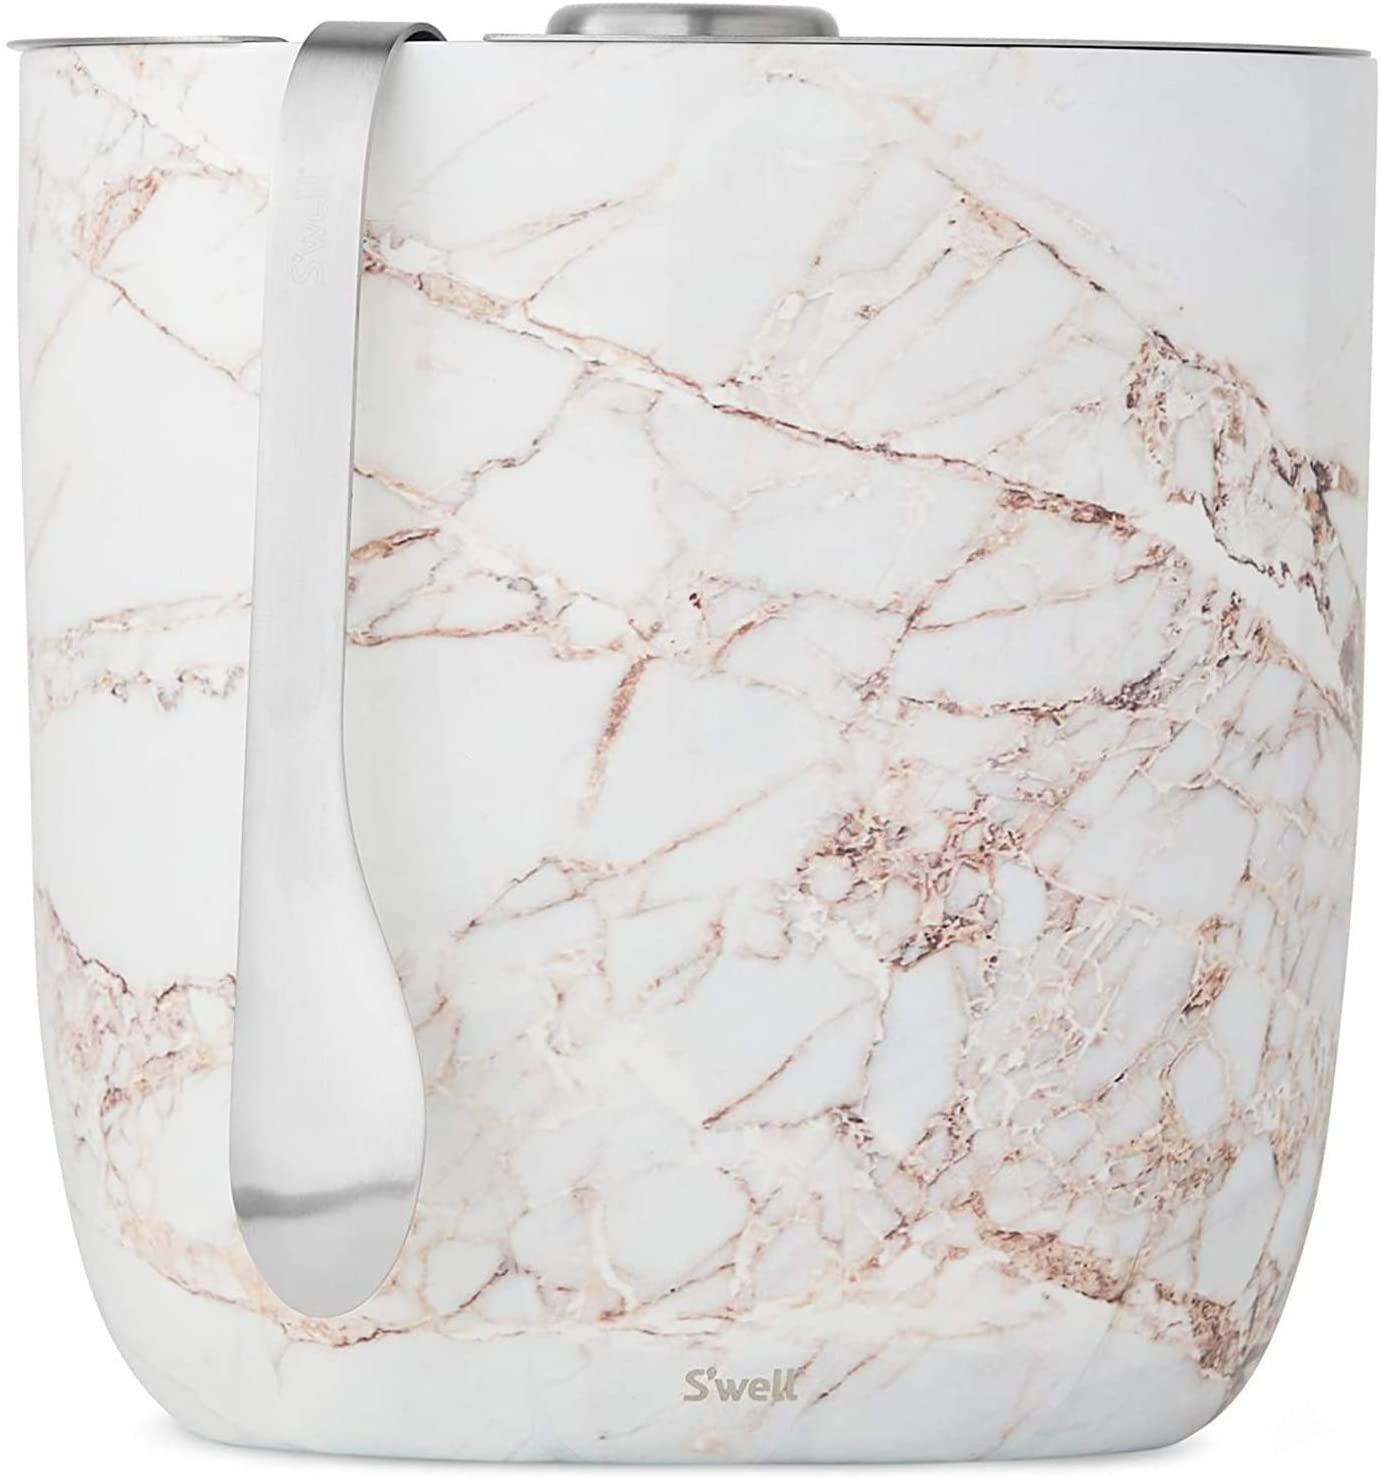 S'well Ice Bucket - 68 Fl Oz - Calacatta Gold, 2L/68oz (13068-B19-01010)